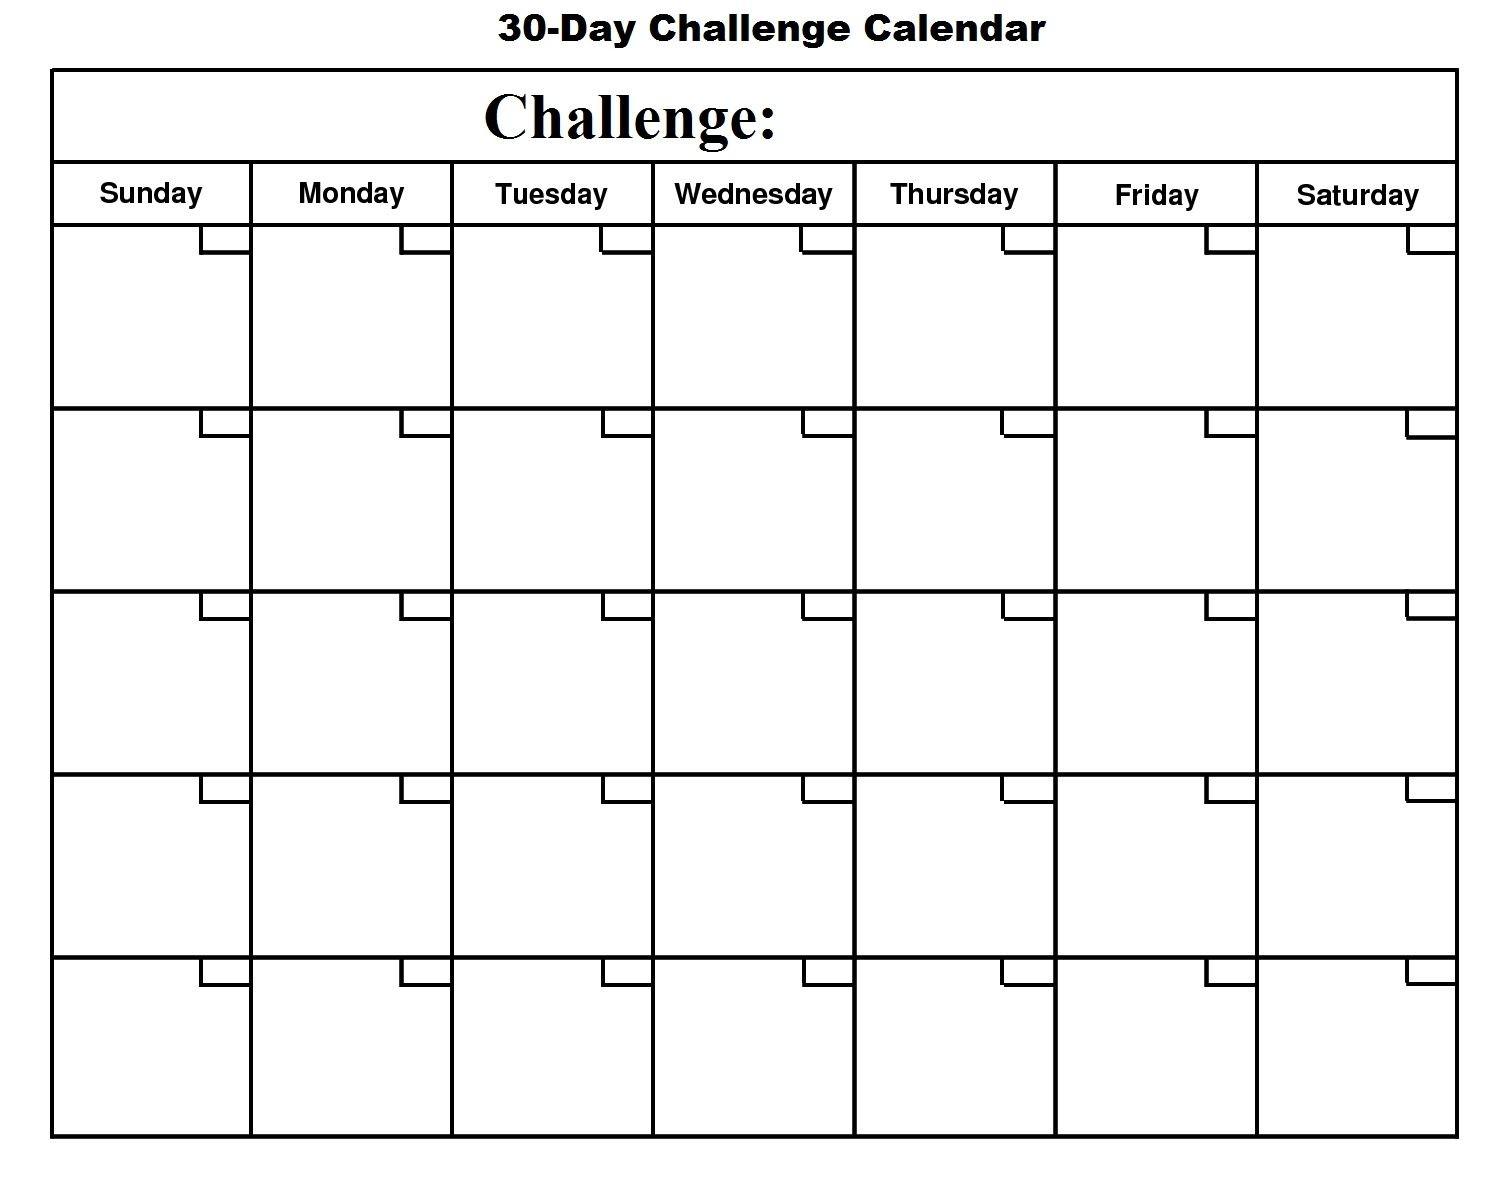 Printable 30 Day Calendar - Printable 360 Degree   Blank  Blank 30-Day Calendar